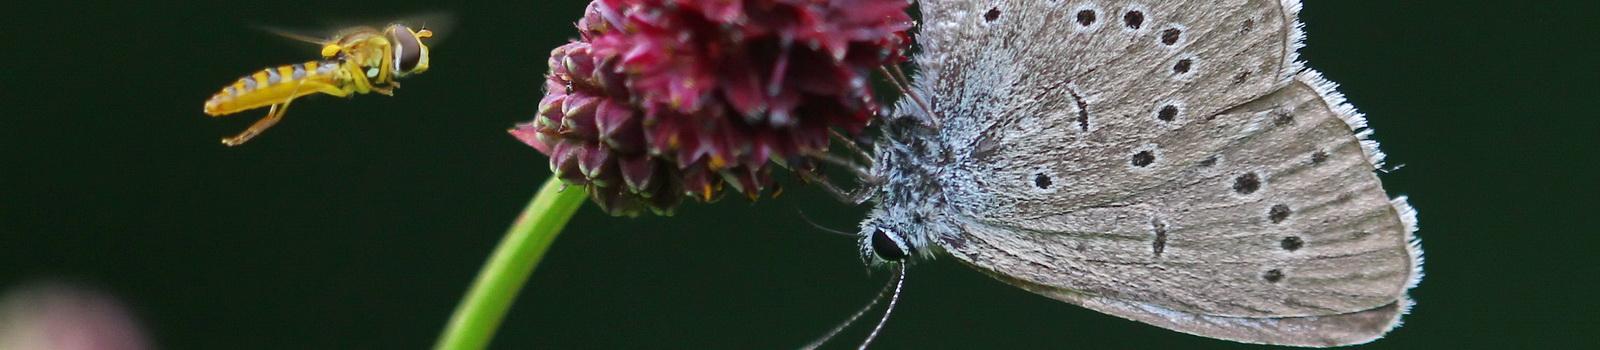 Heller Wiesenkopf-Ameisen Bläuling